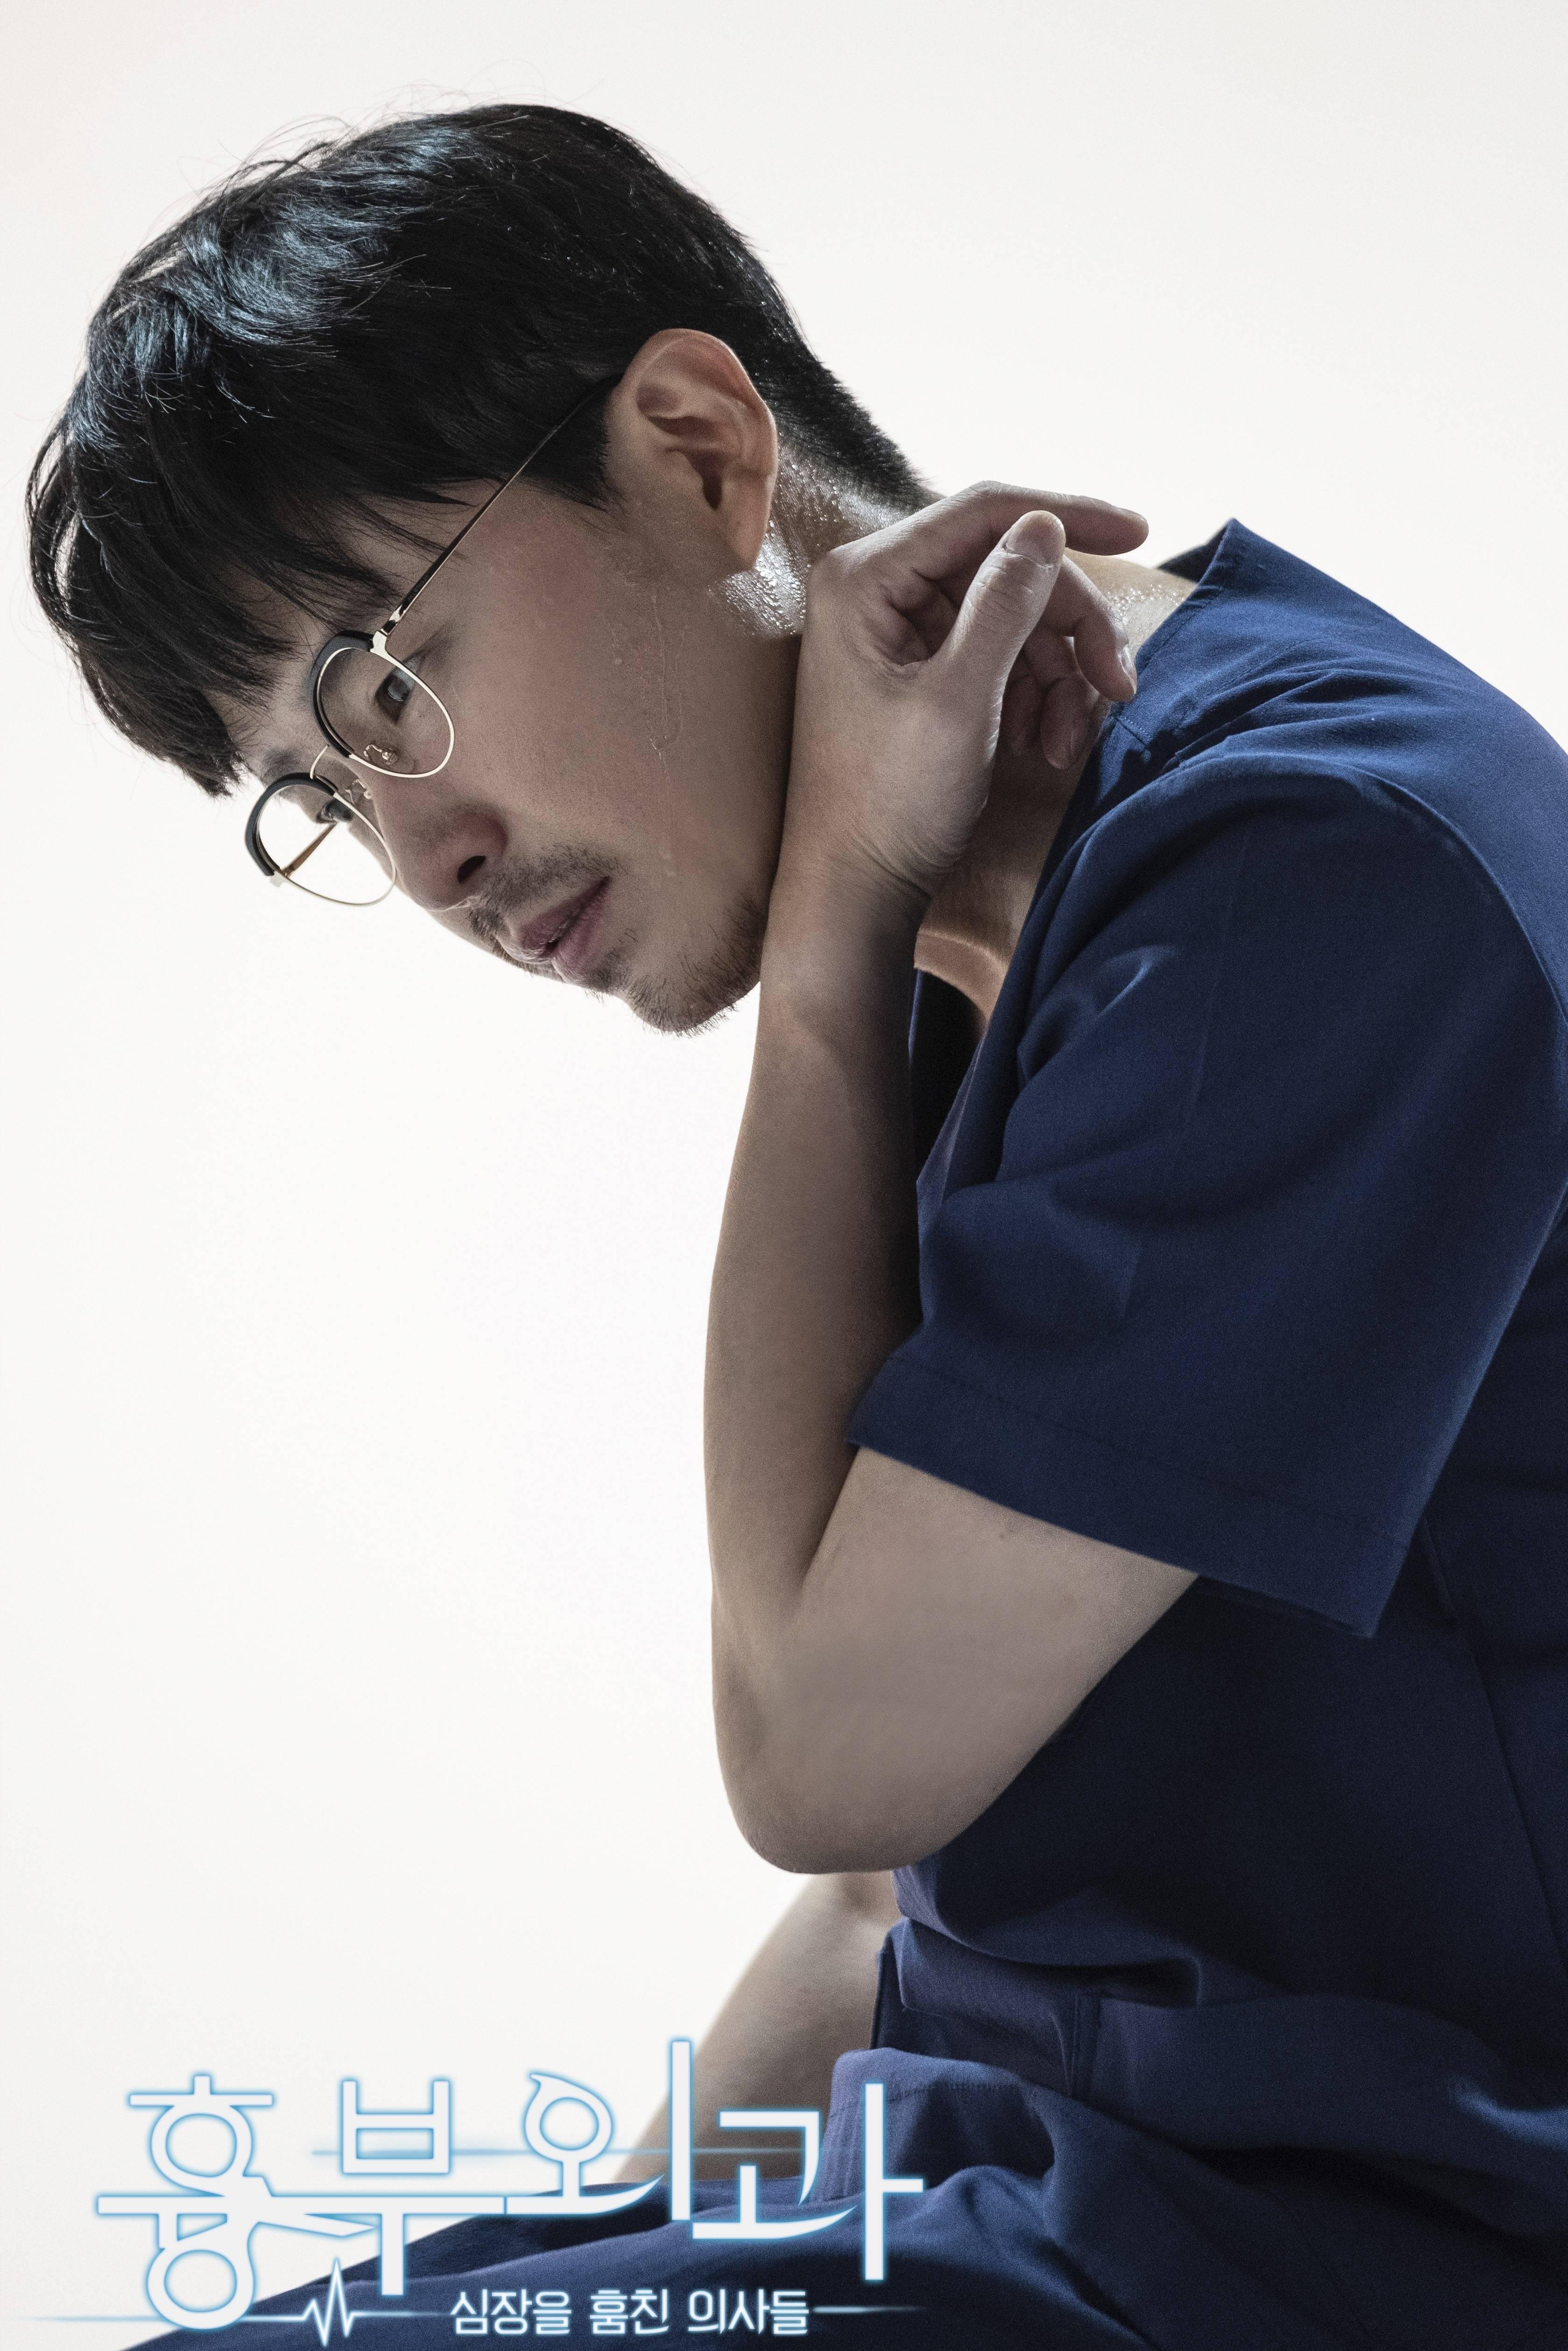 Two Lives One Heart Korean Drama 2018 흉부외과 심장을 훔친 의사들 Hancinema The Korean Movie And Drama Database